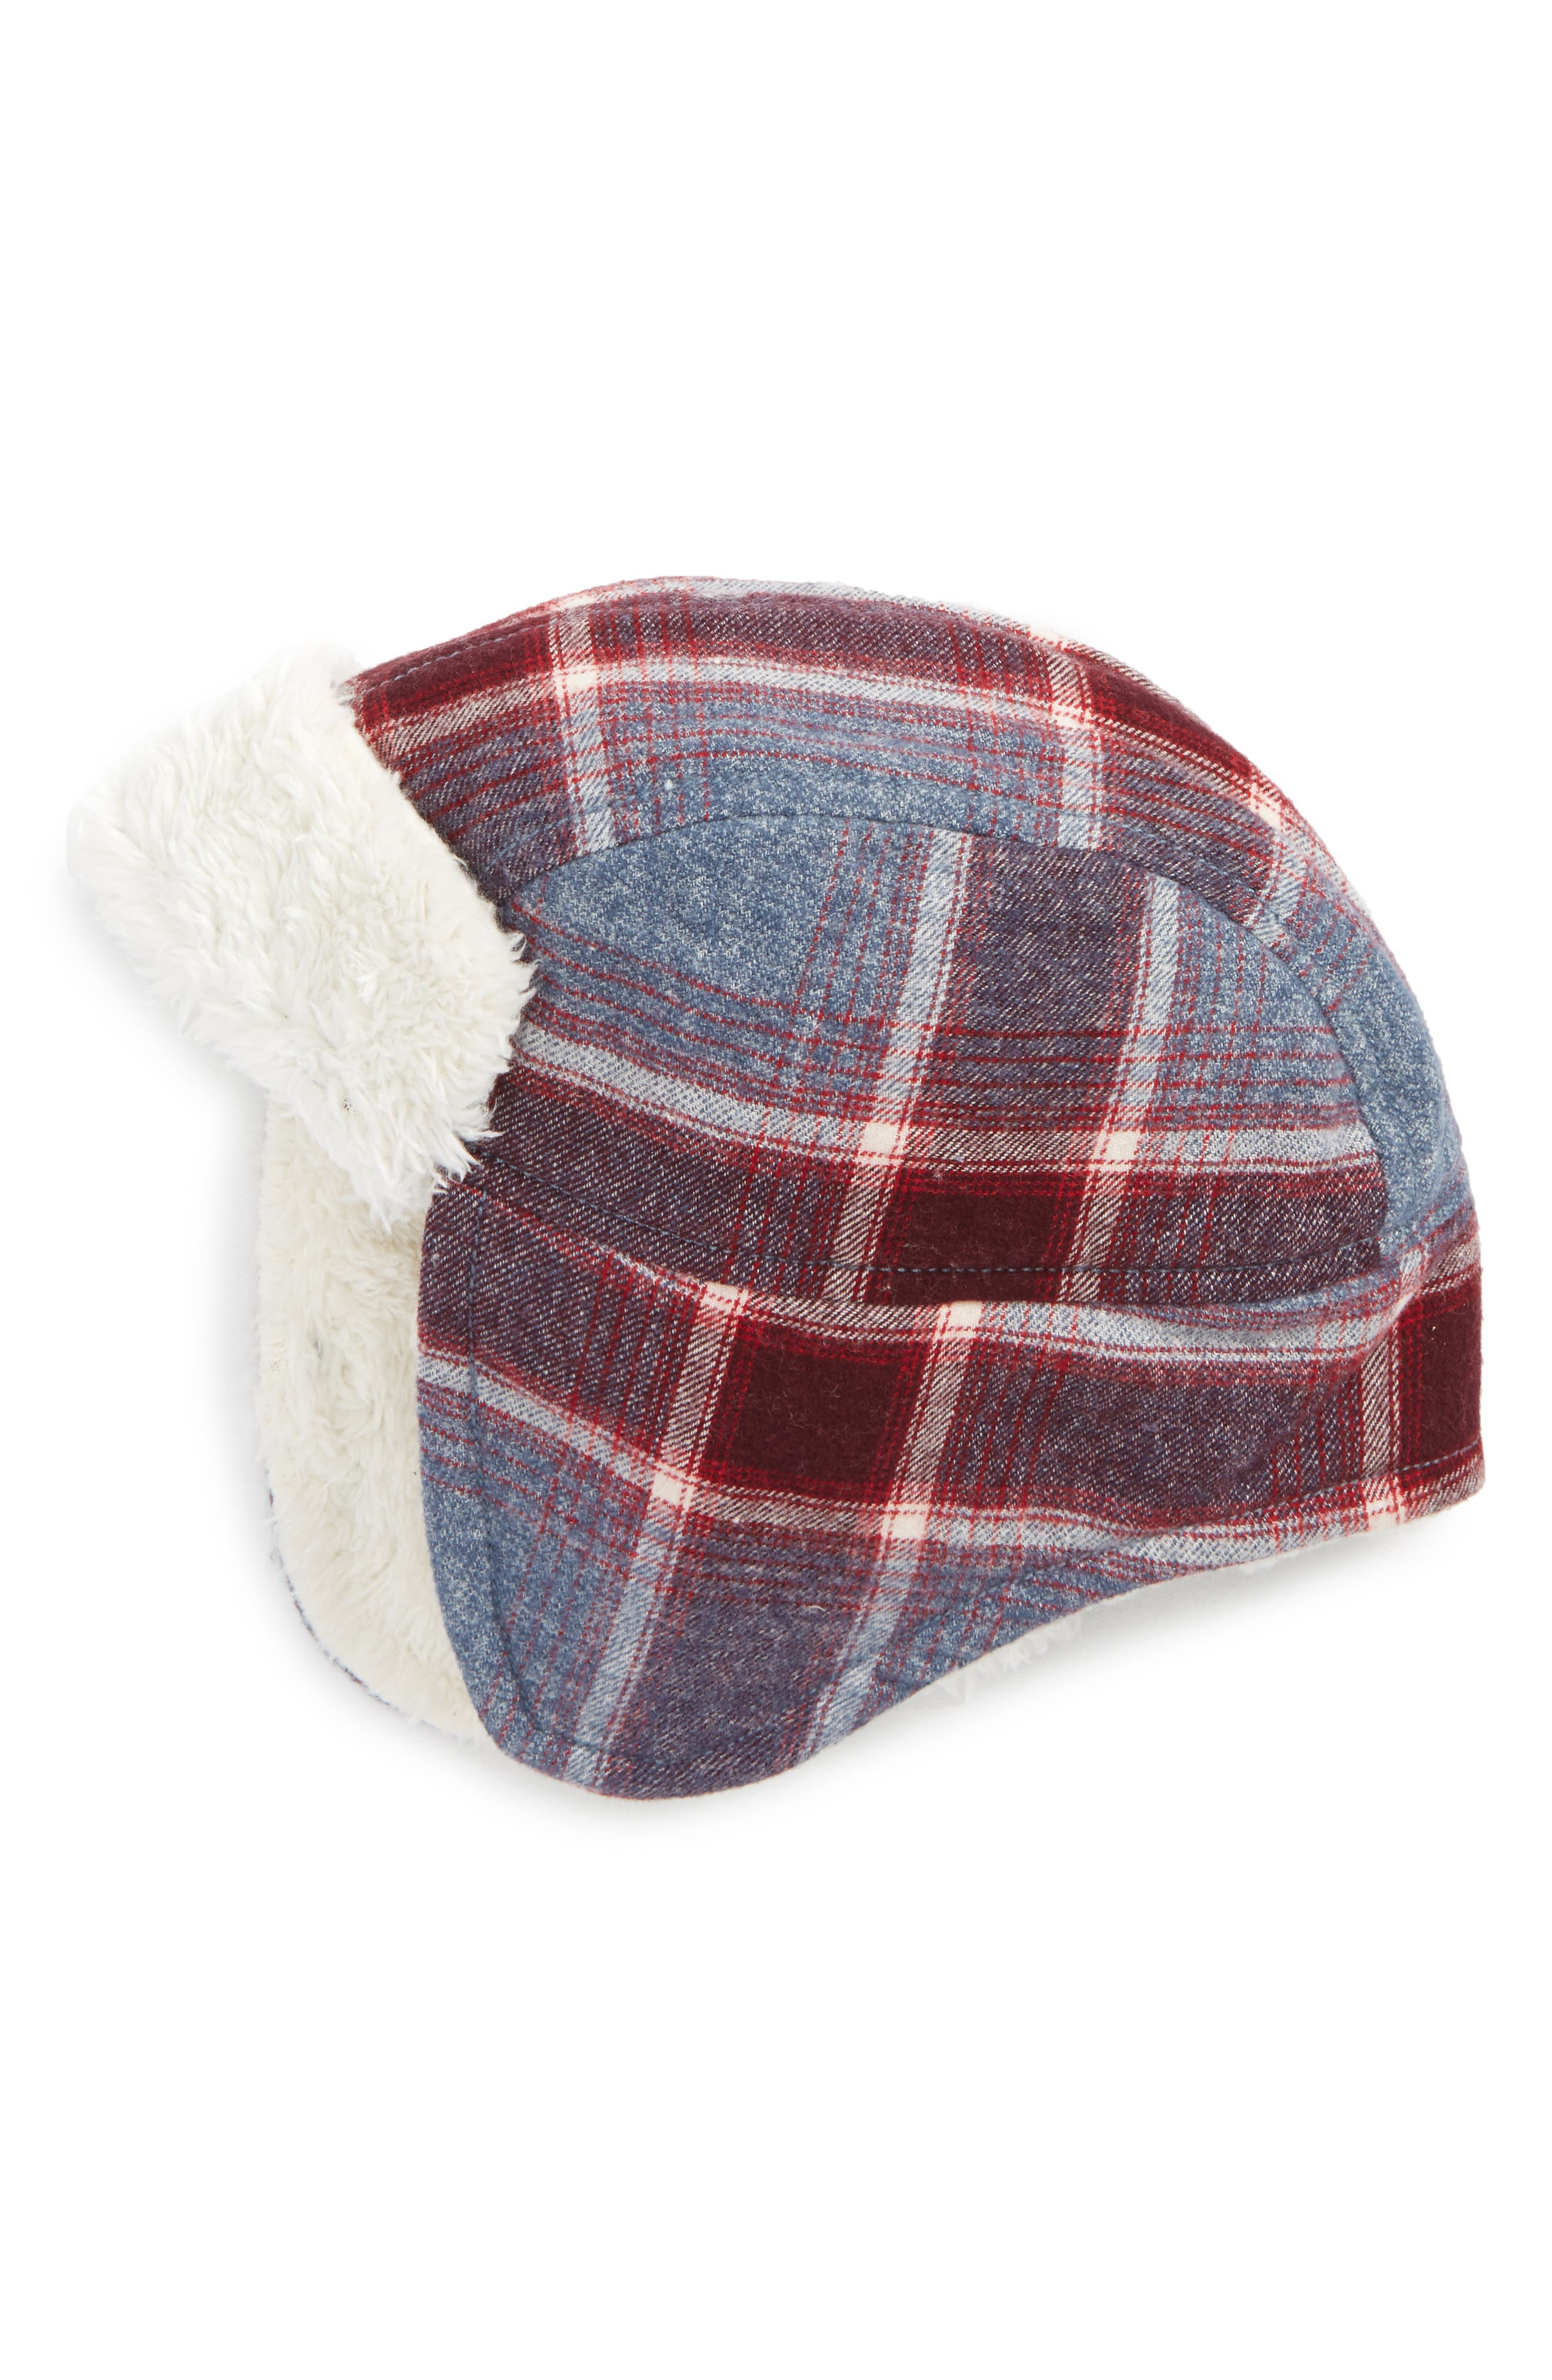 Alternate Image 1 Selected - Tucker + Tate Flight Hat (Baby Boys & Toddler Boys)